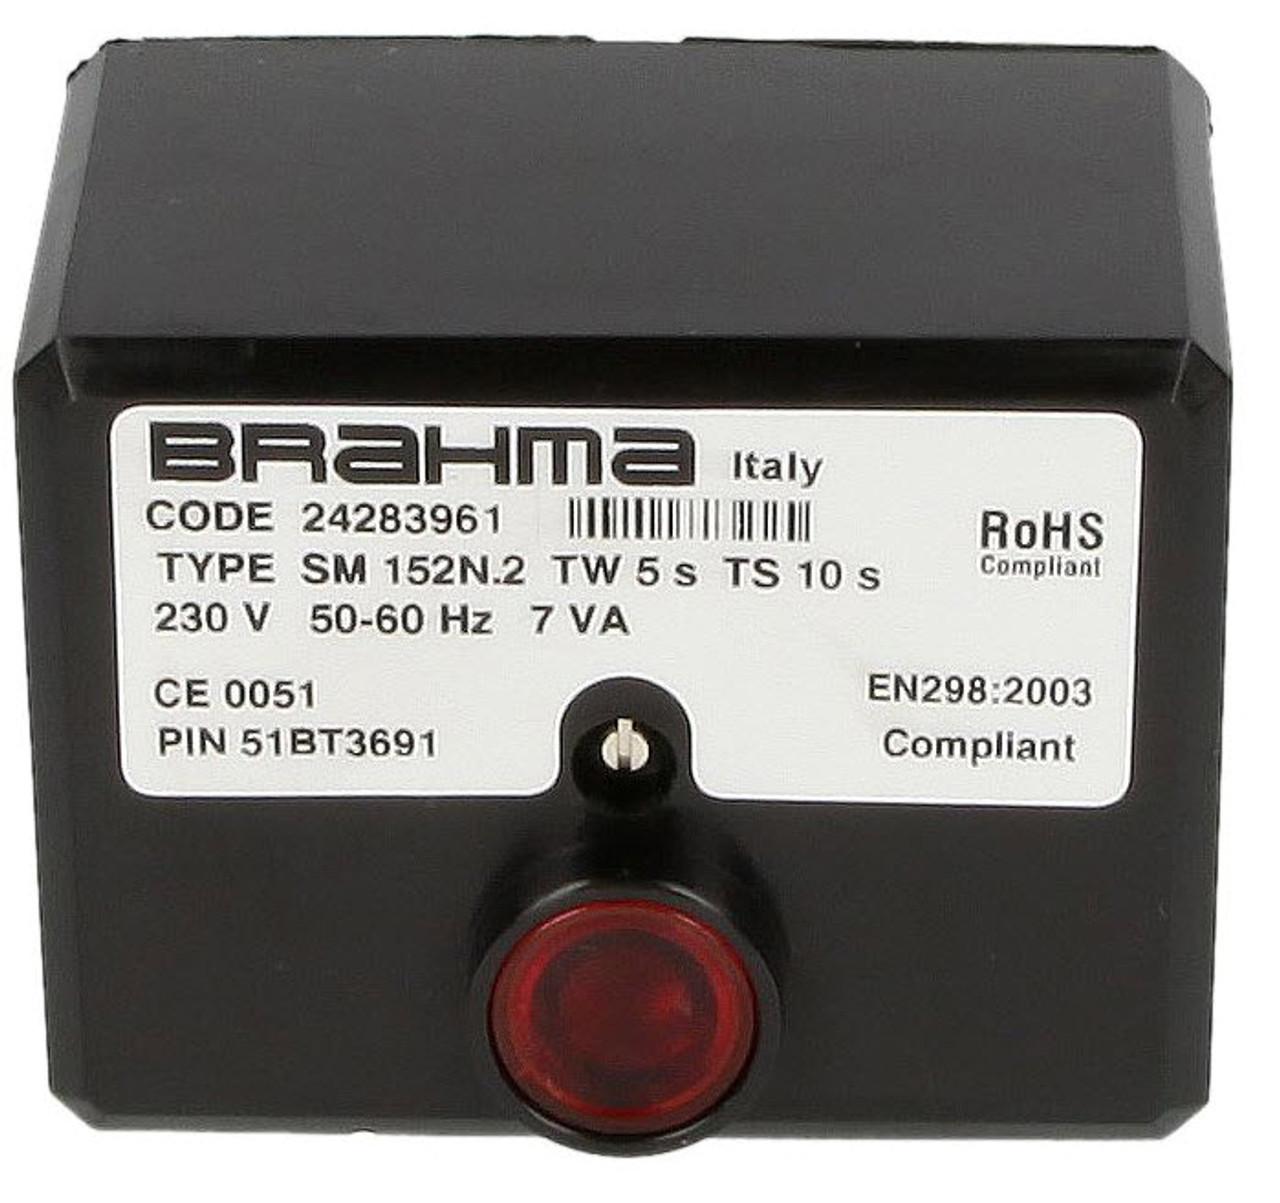 Brahma control unit SM 152.2, 24283961